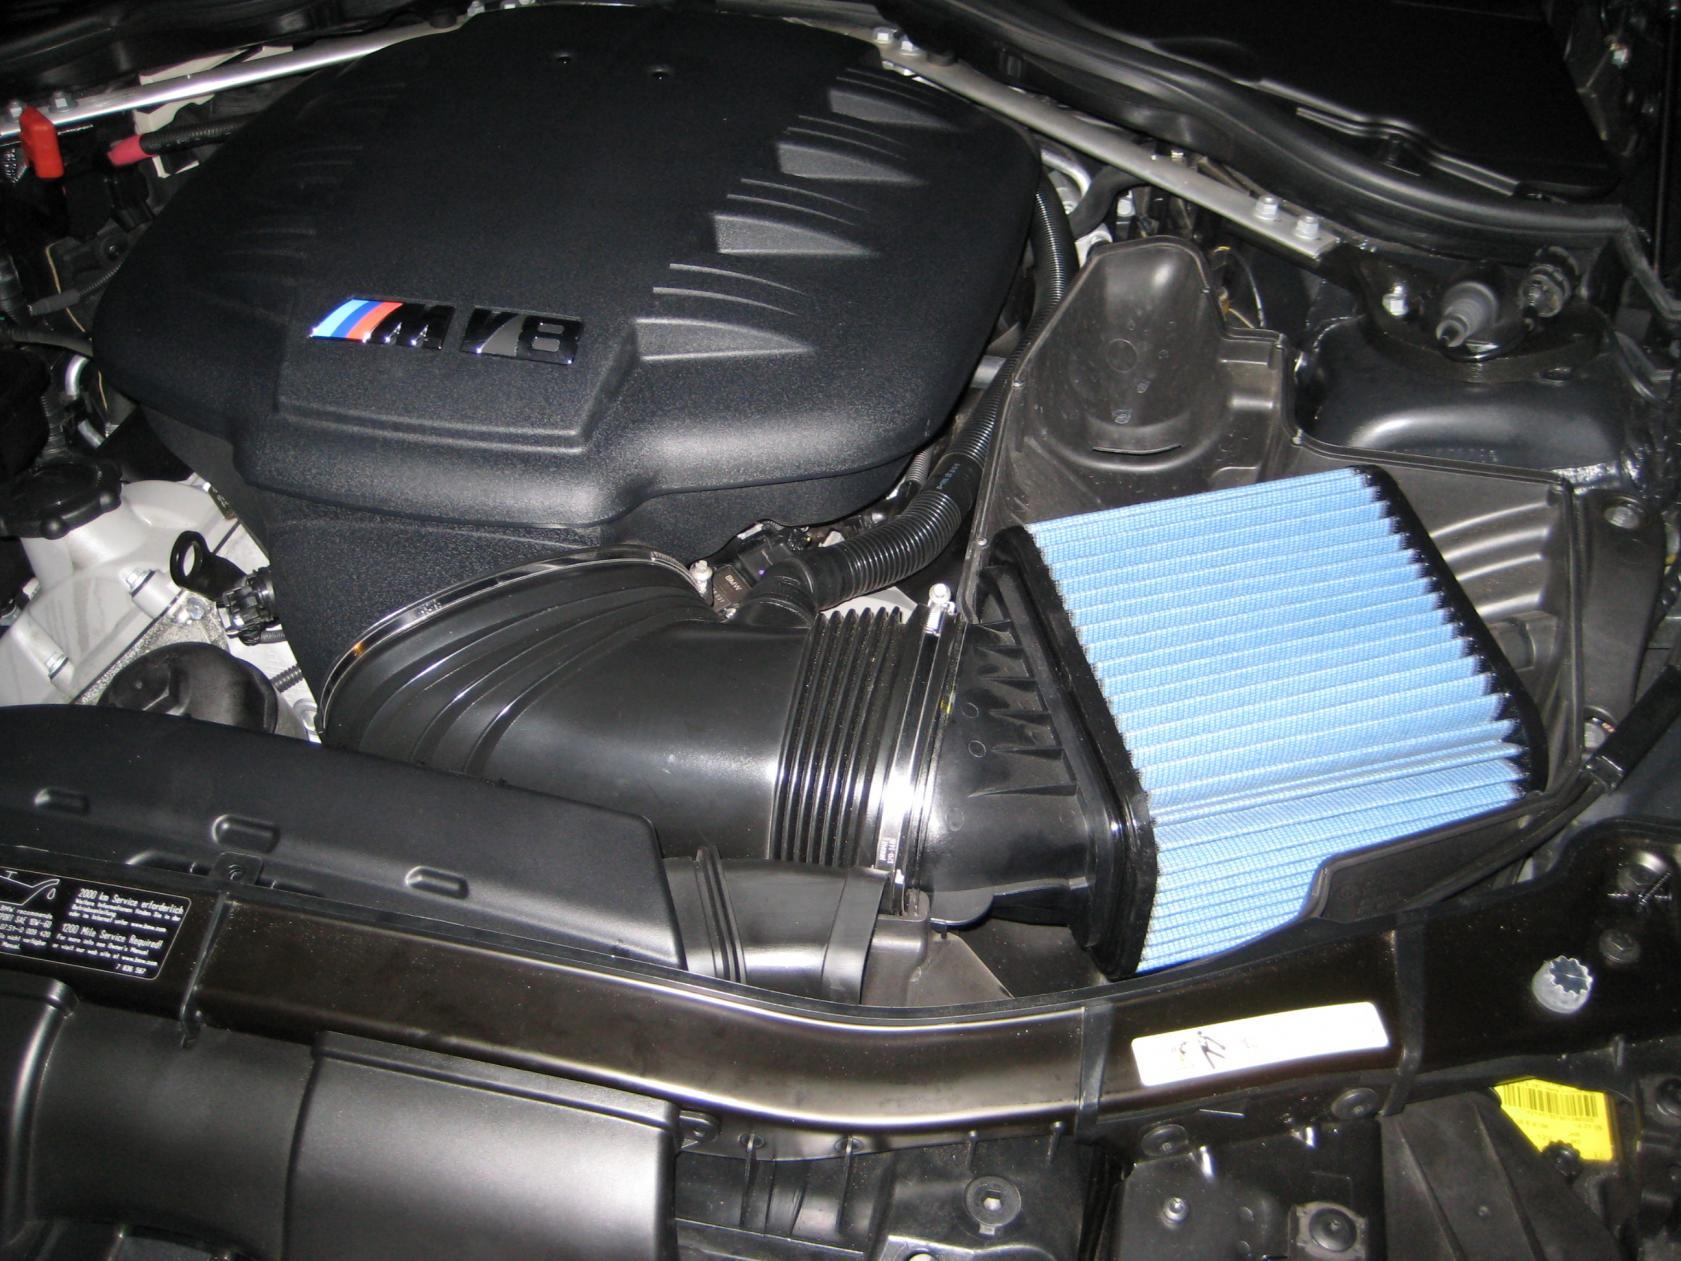 2002 Bmw 525i Fuse Box Location Manual Of Wiring Diagram 530i M5 Brakes Elsavadorla